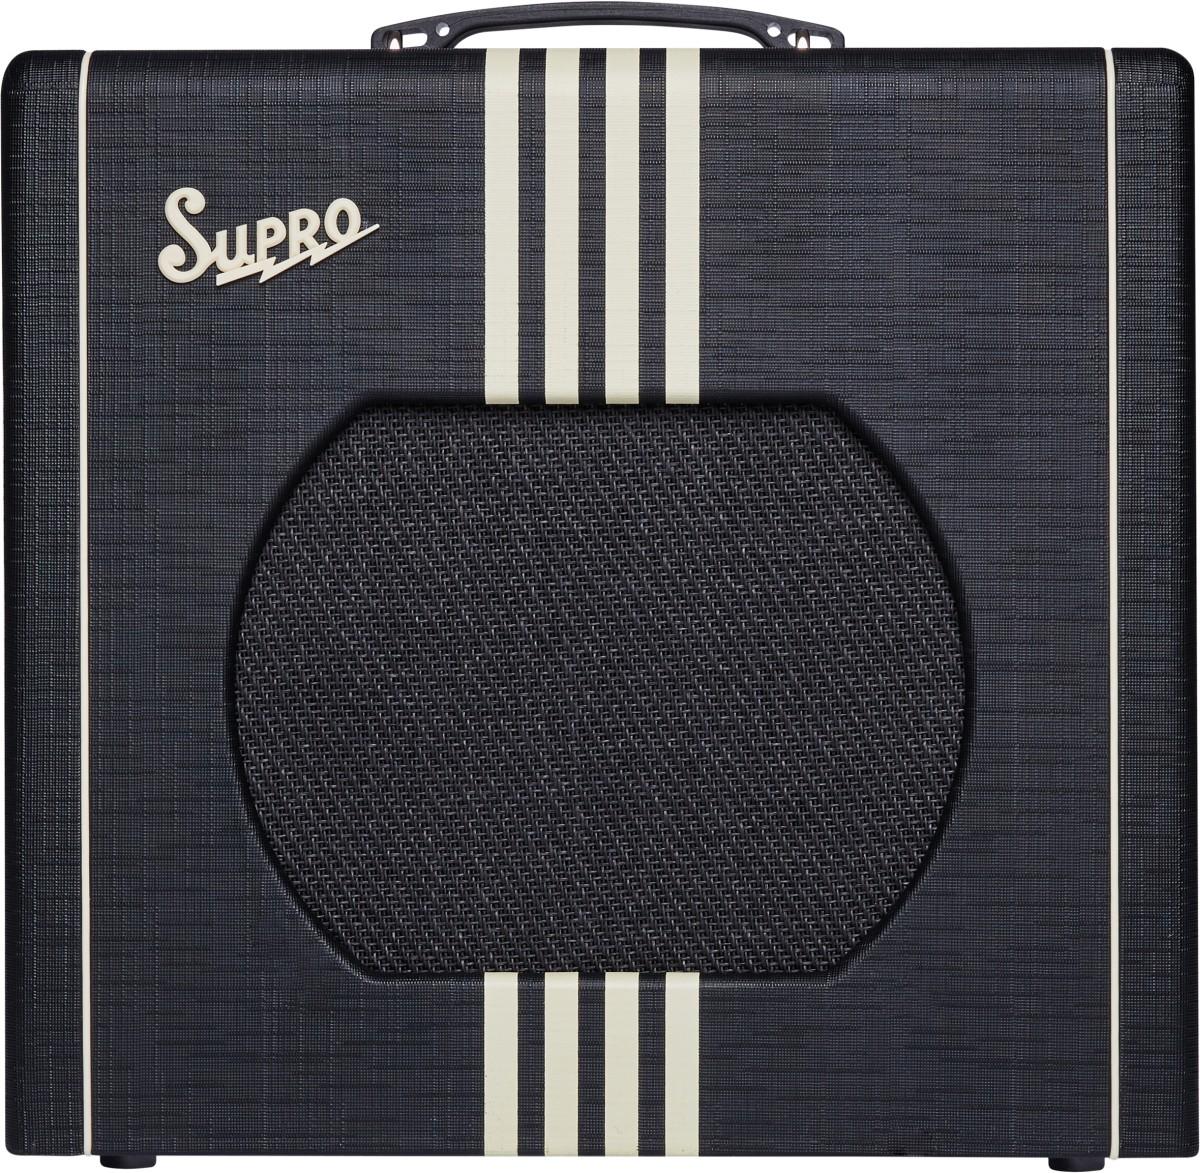 Supro Delta King 12 Combo 1x12 Black   Cream